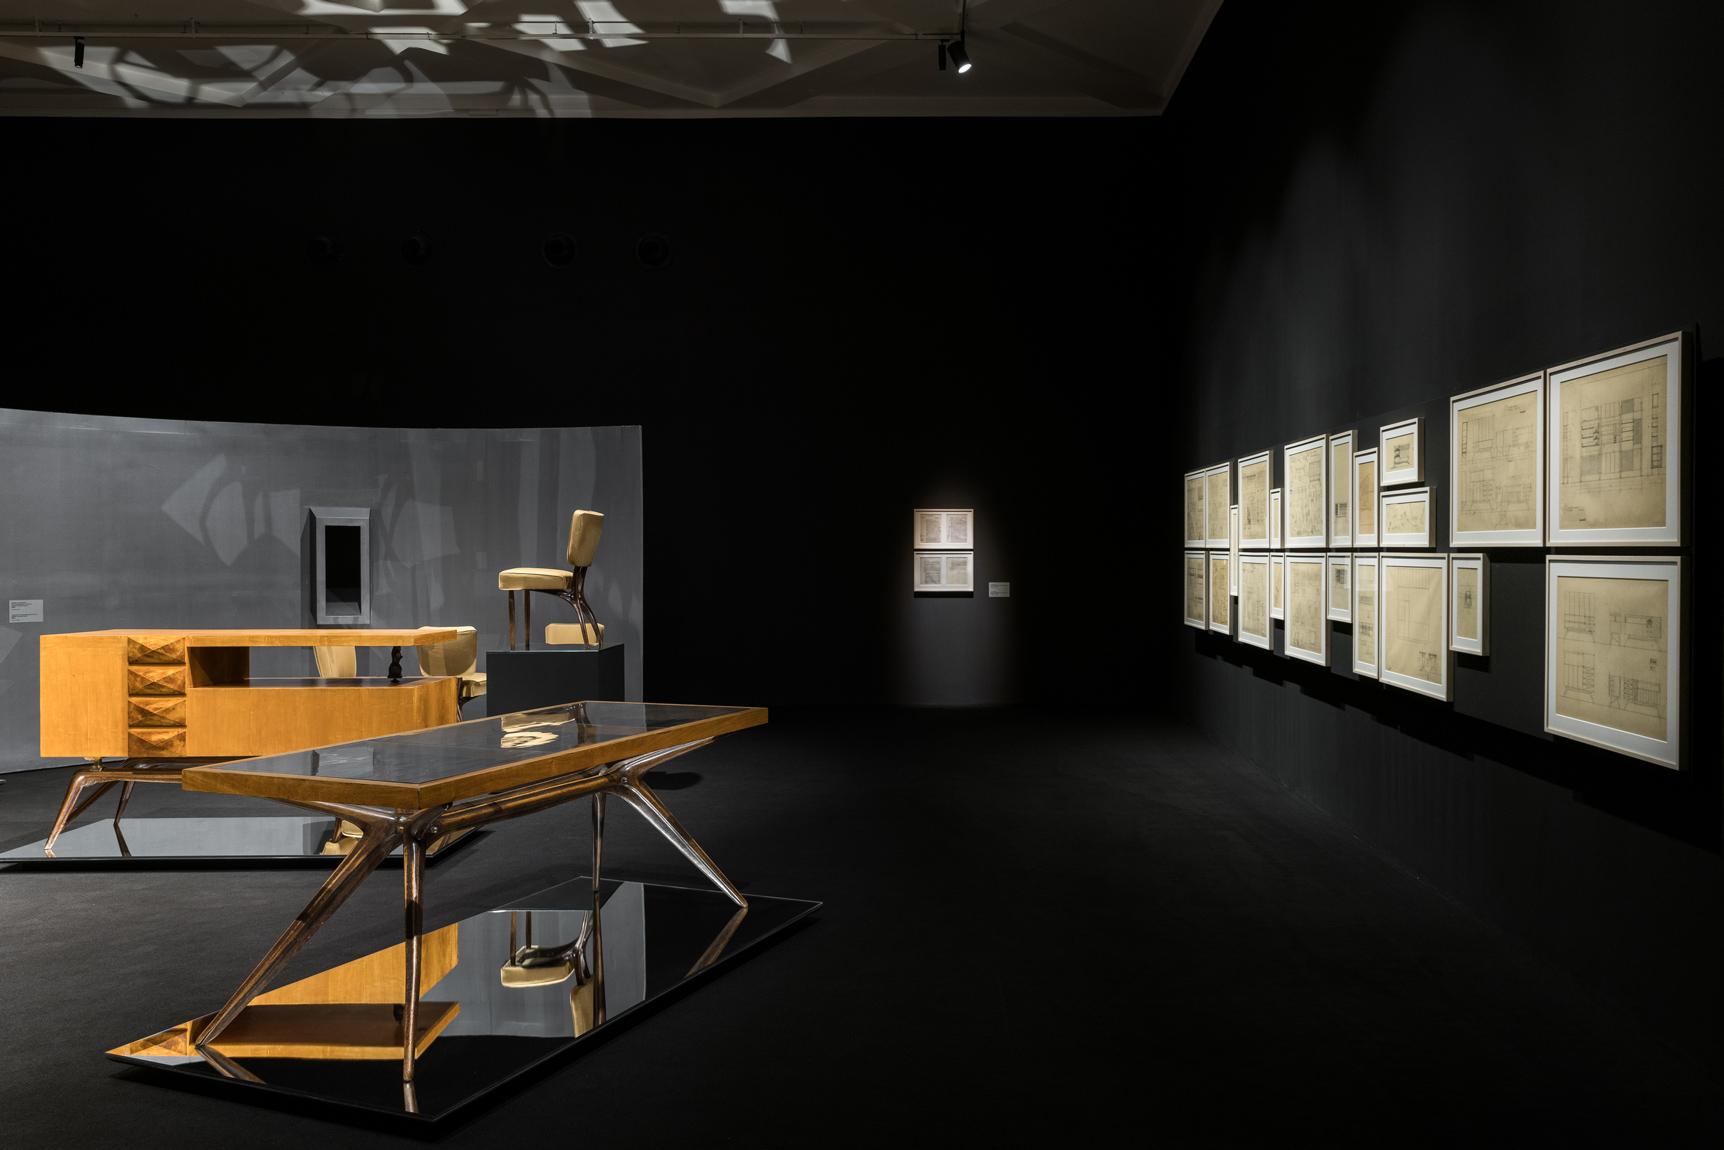 fuorisalone-2021-triennale-1_RF2A4651---©-Triennale-Milano---foto-Gianluca-Di-Ioialiving-corriere